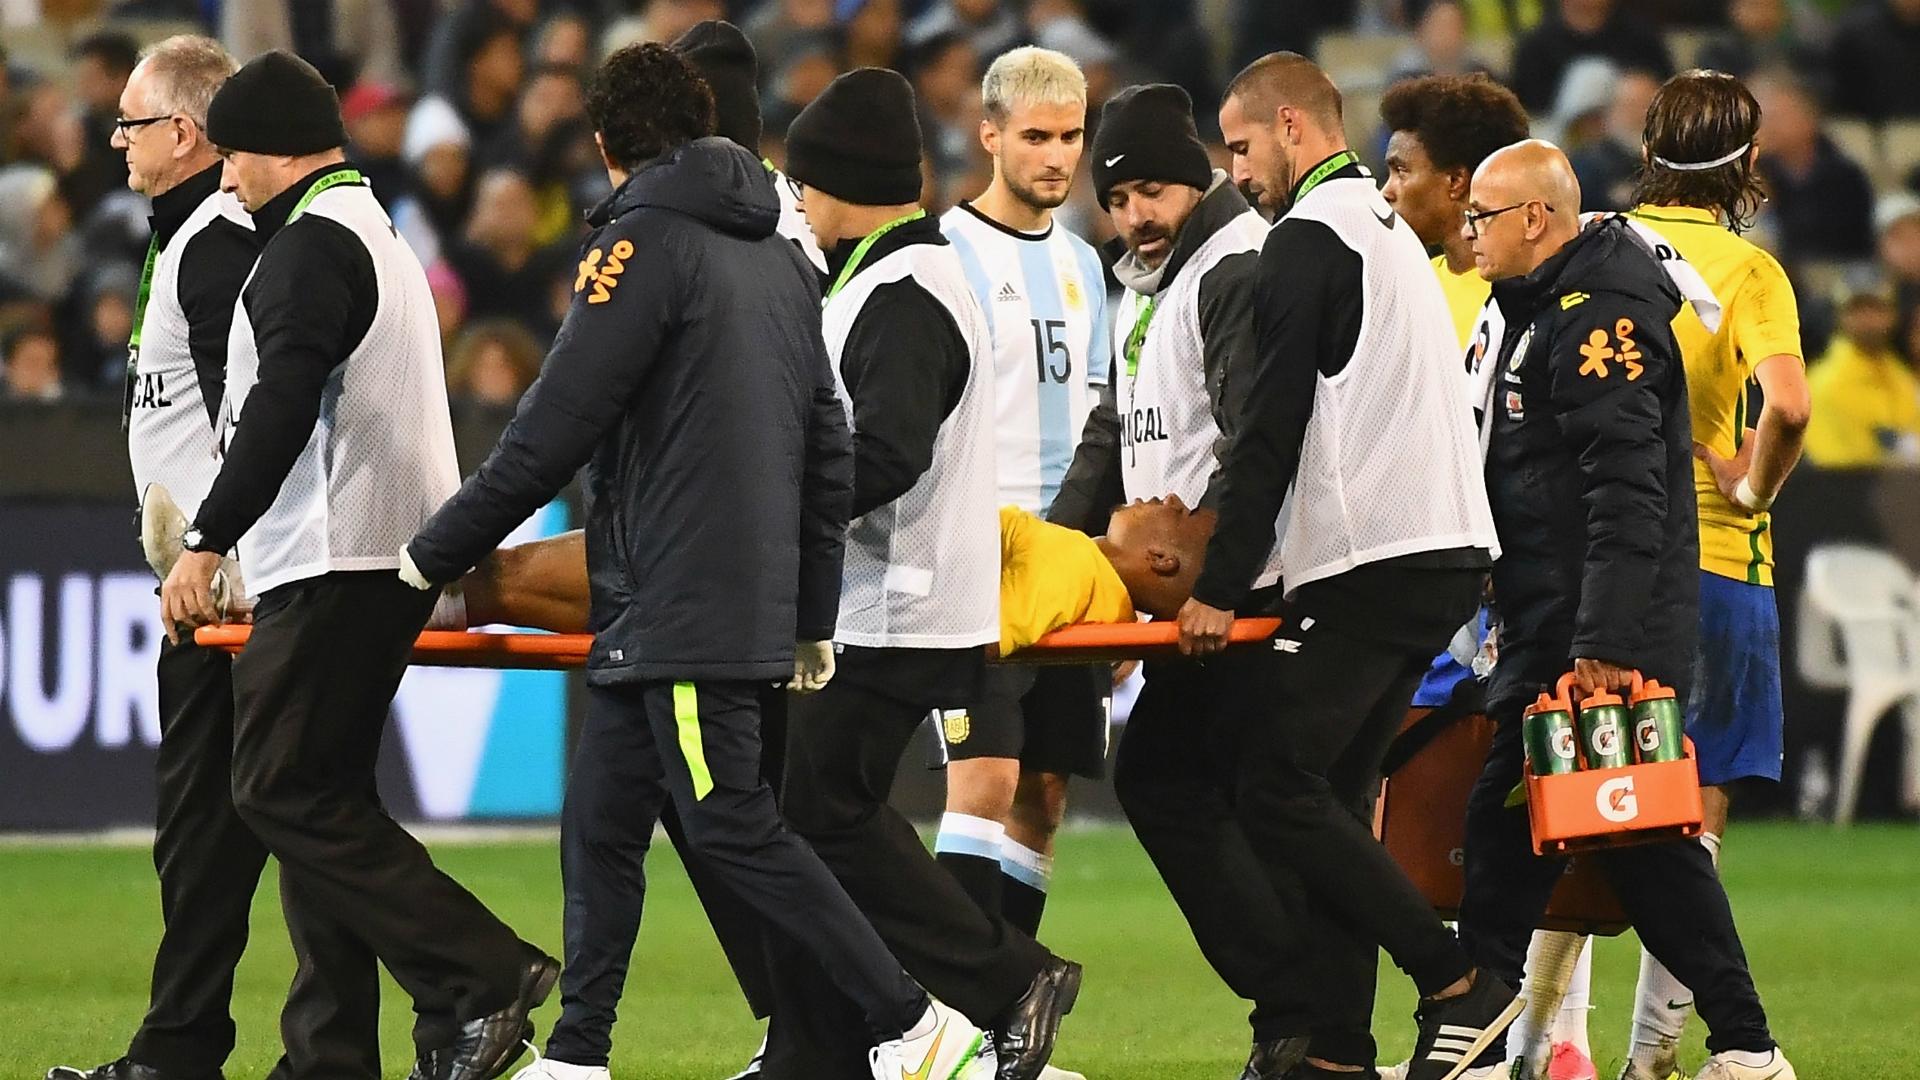 Brazilian Gabriel Jesus was injured in the friendly game against Argentina